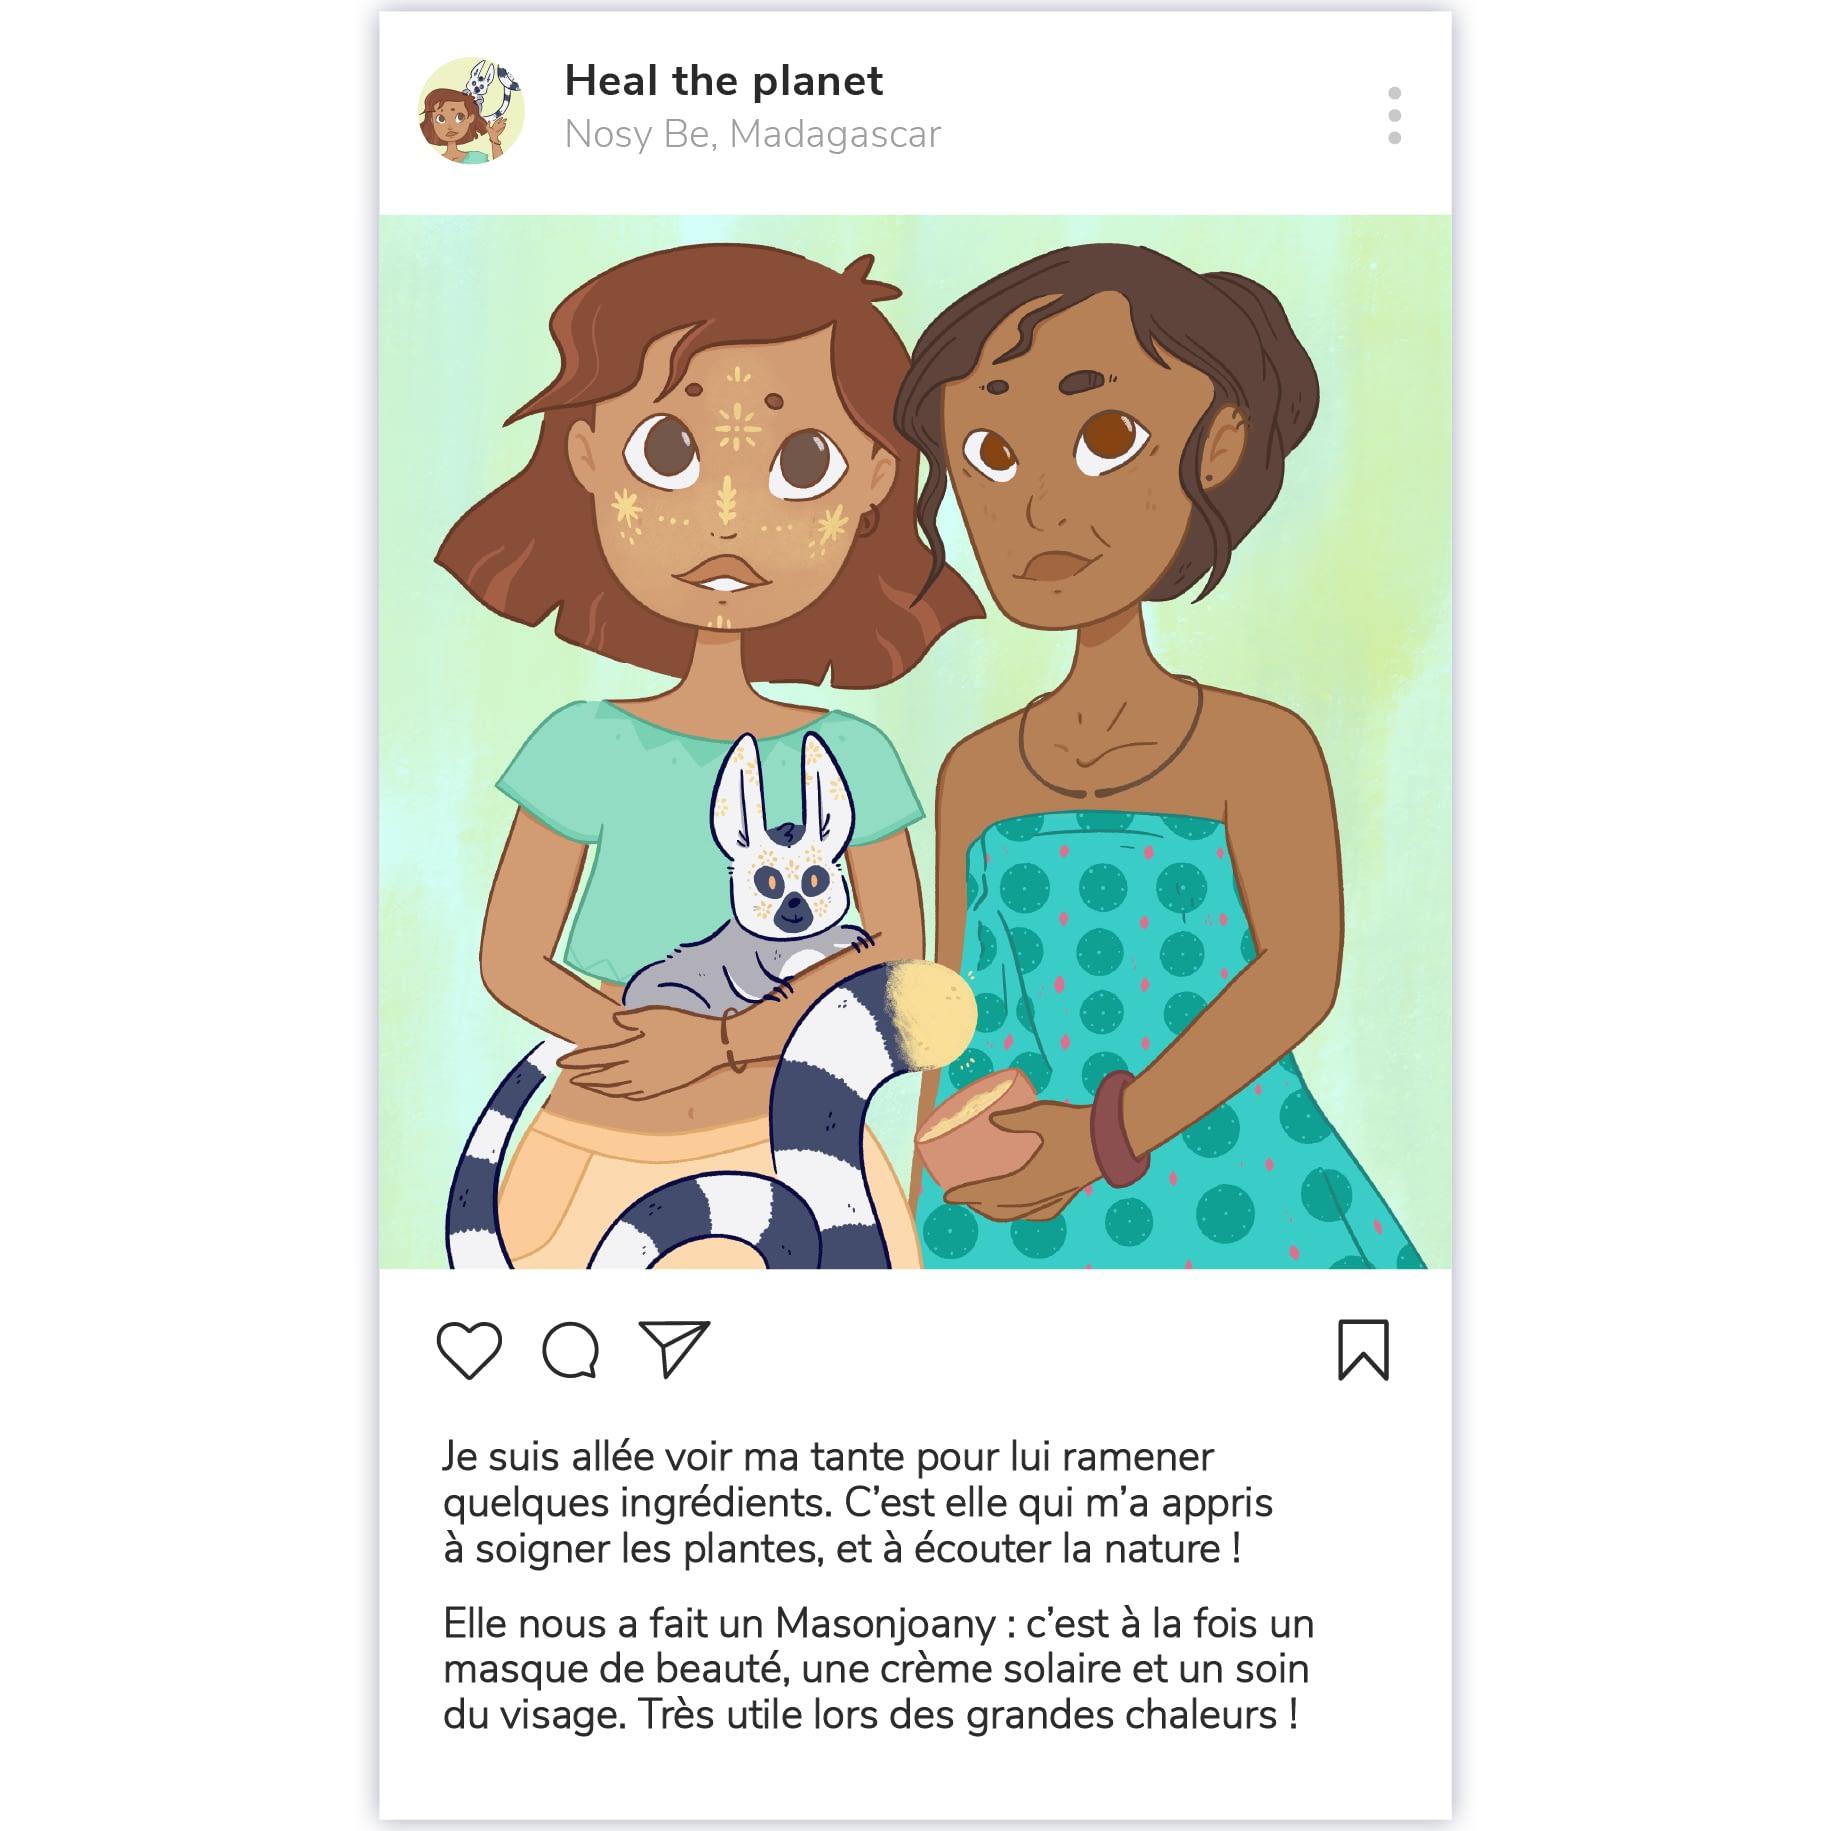 Heal the planet, social media